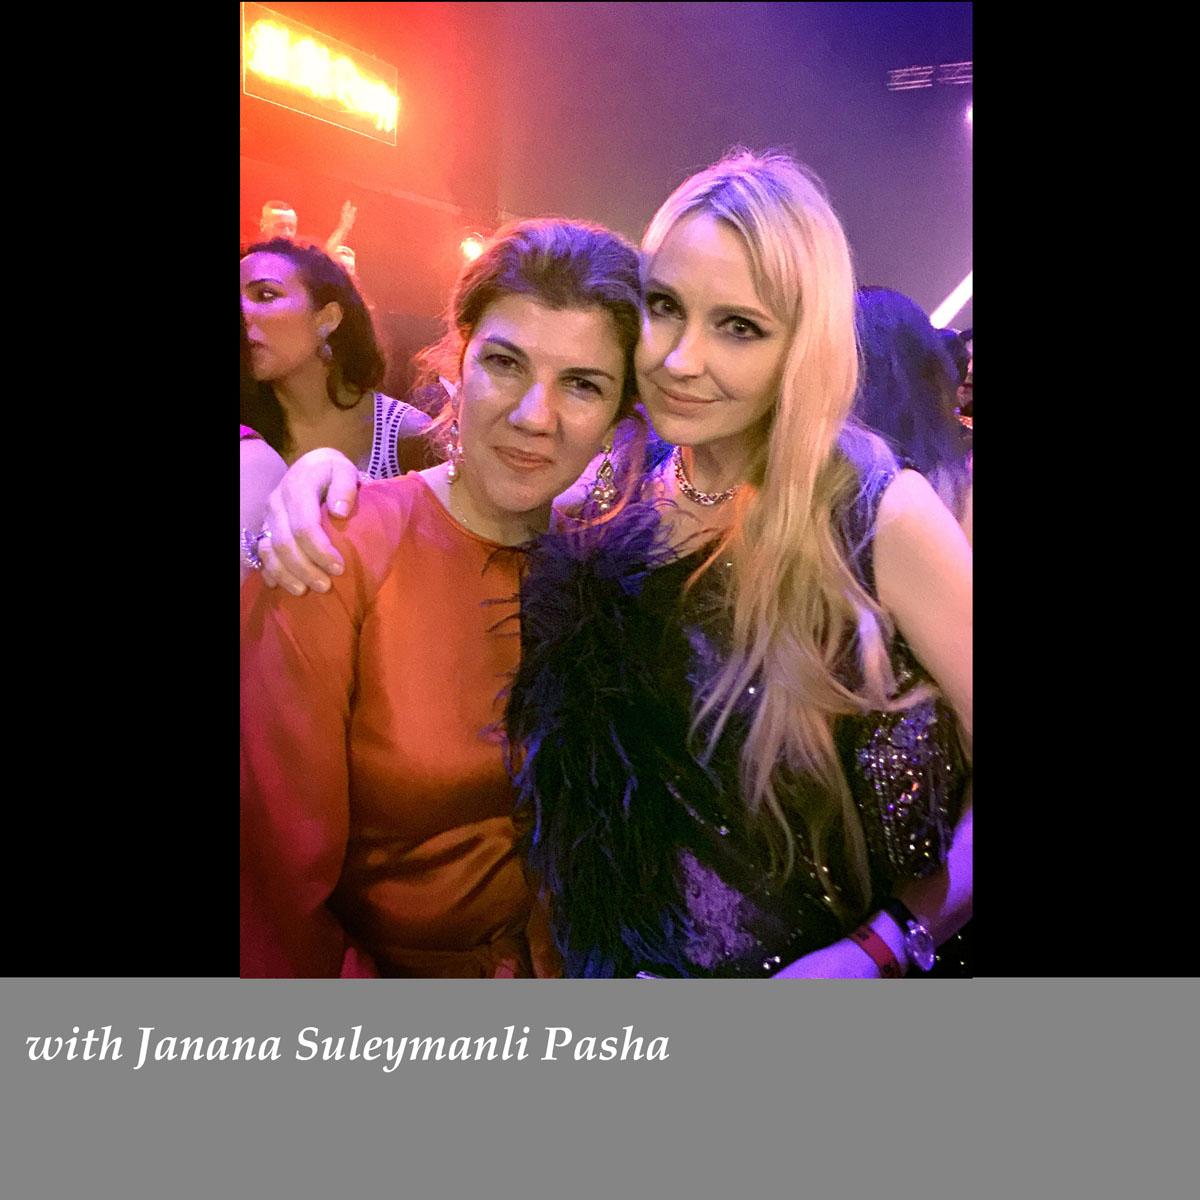 with-Janana-Suleymanli-Pasha